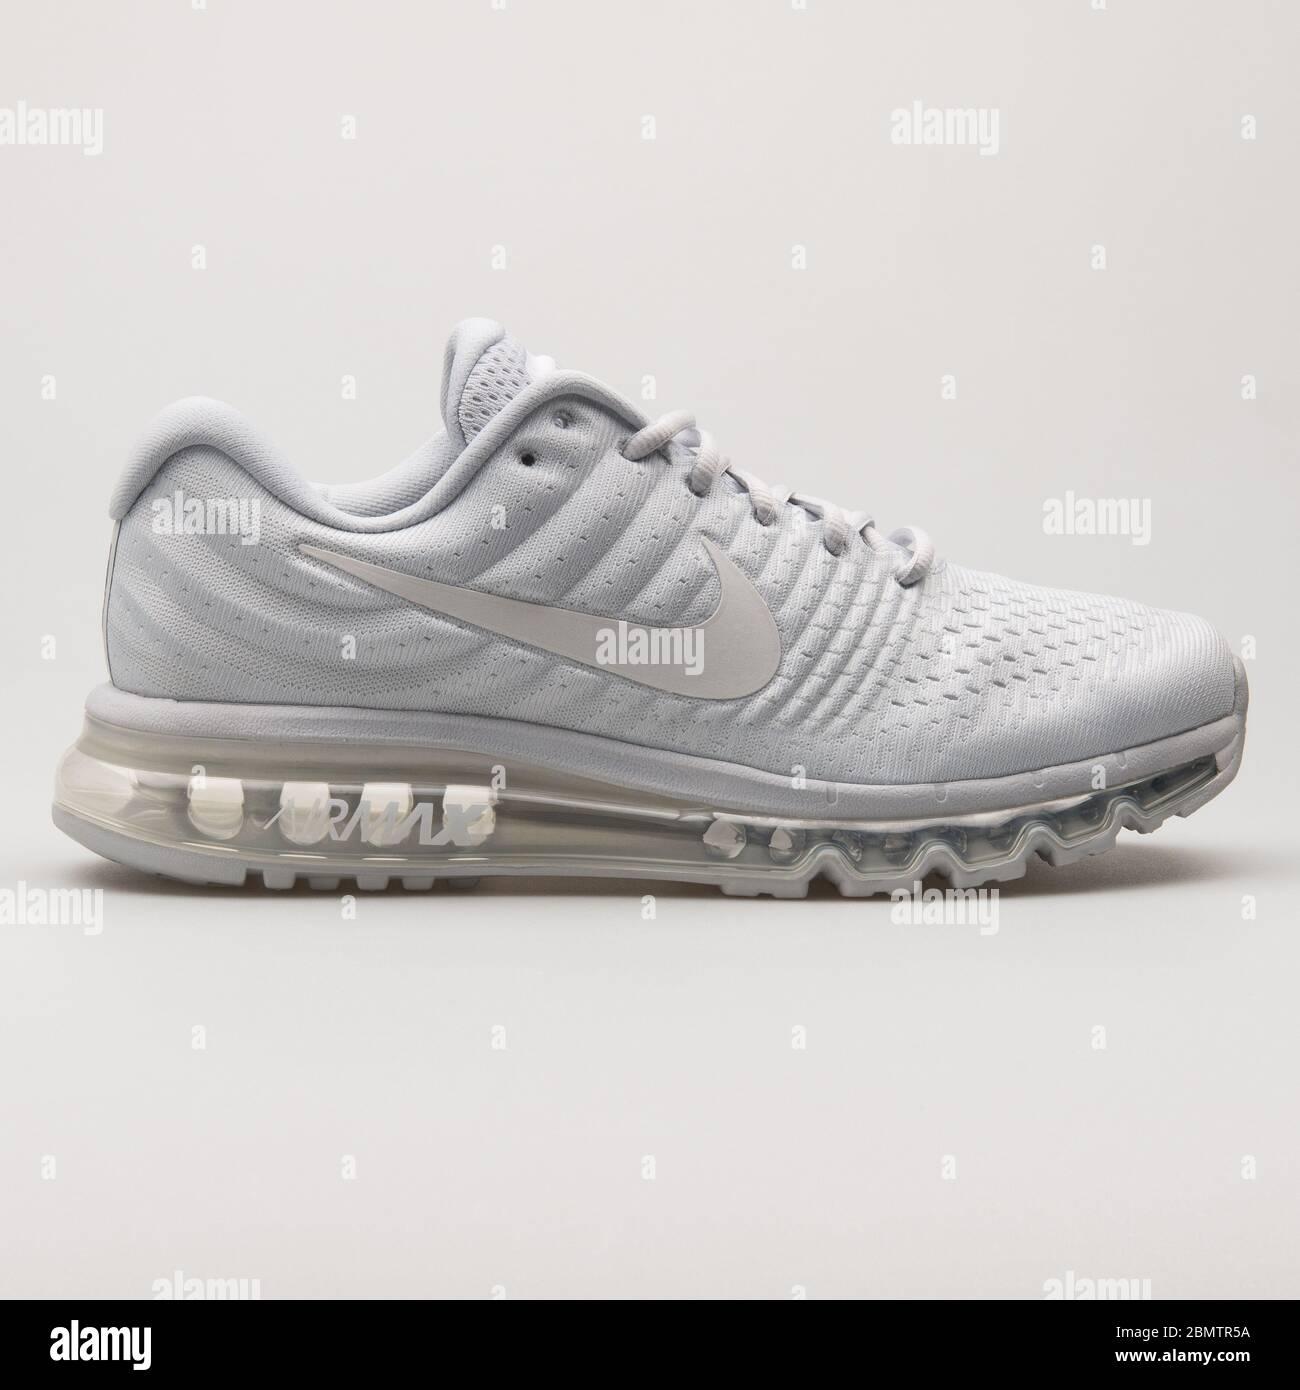 Nike Air Max 2017 SE platinum white